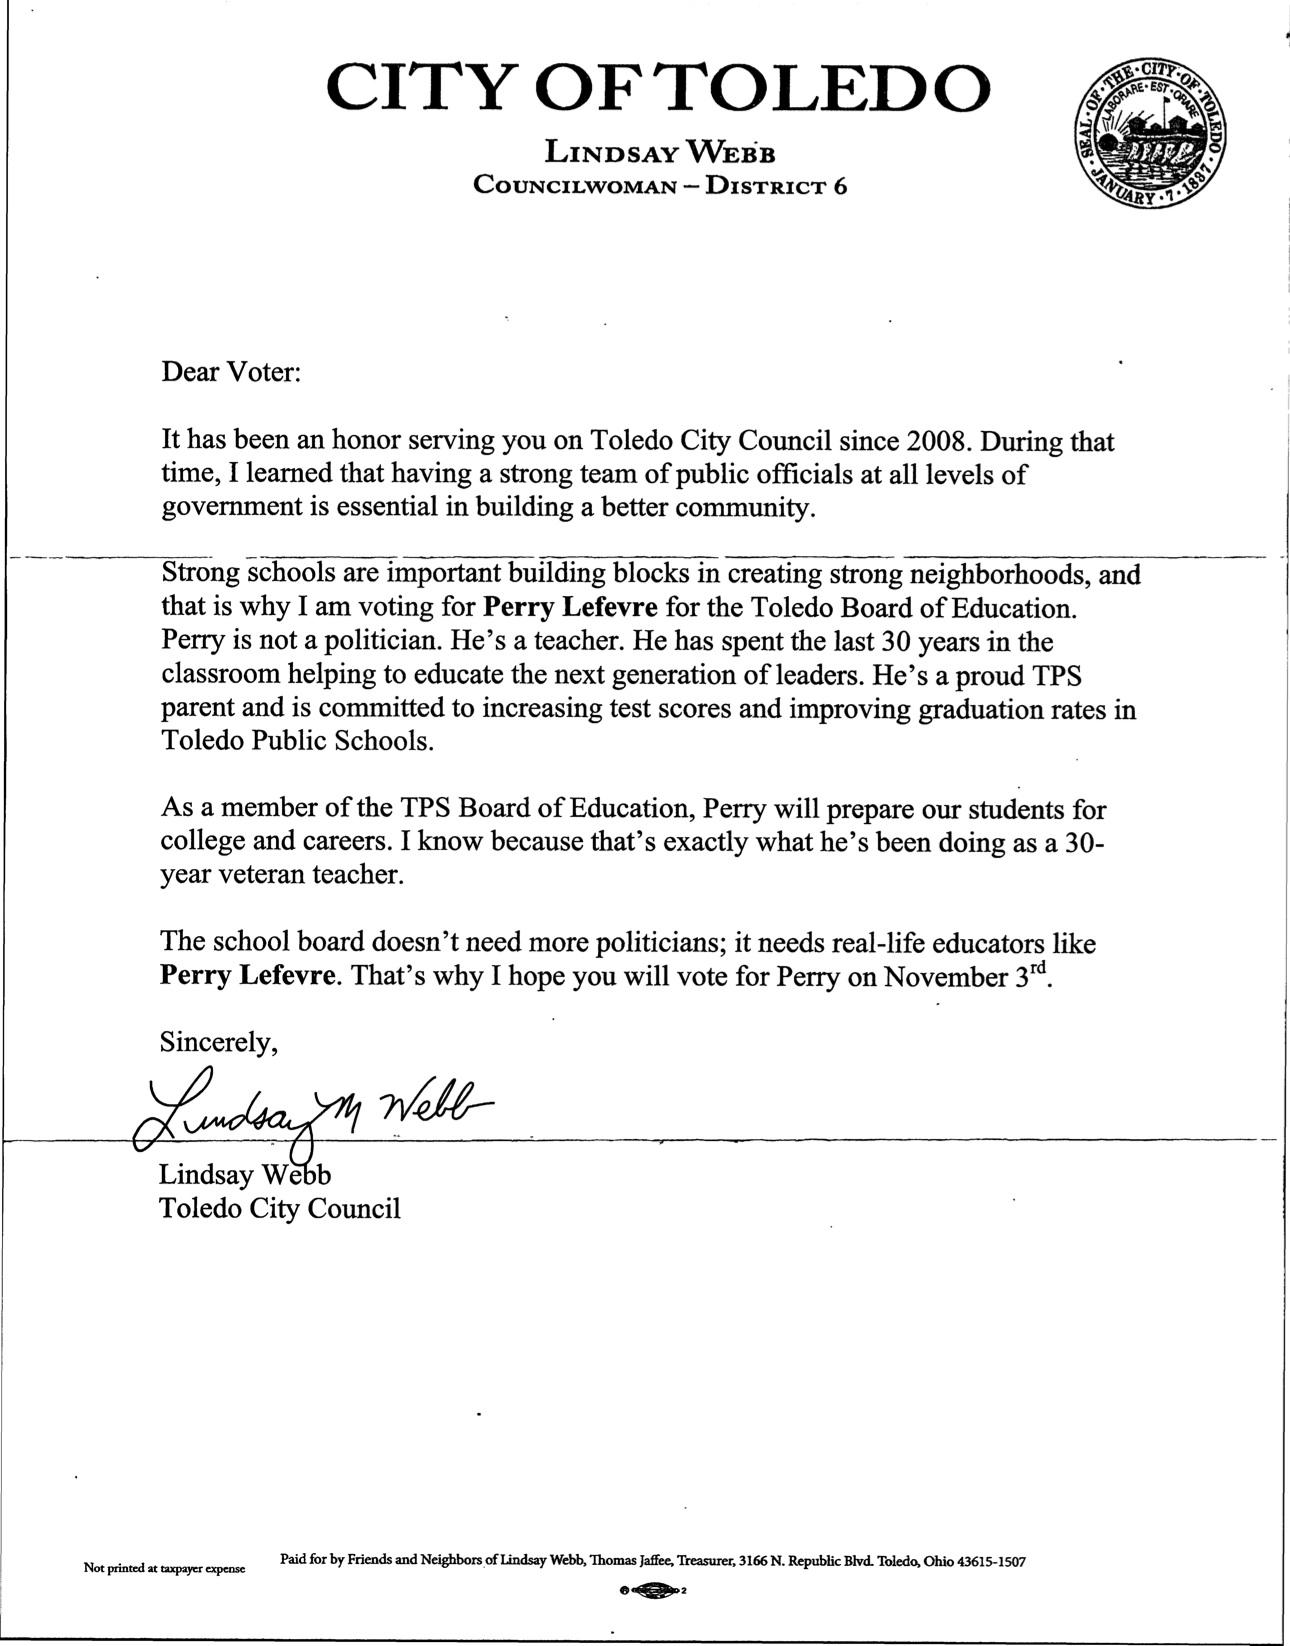 Lindsay Webb letter